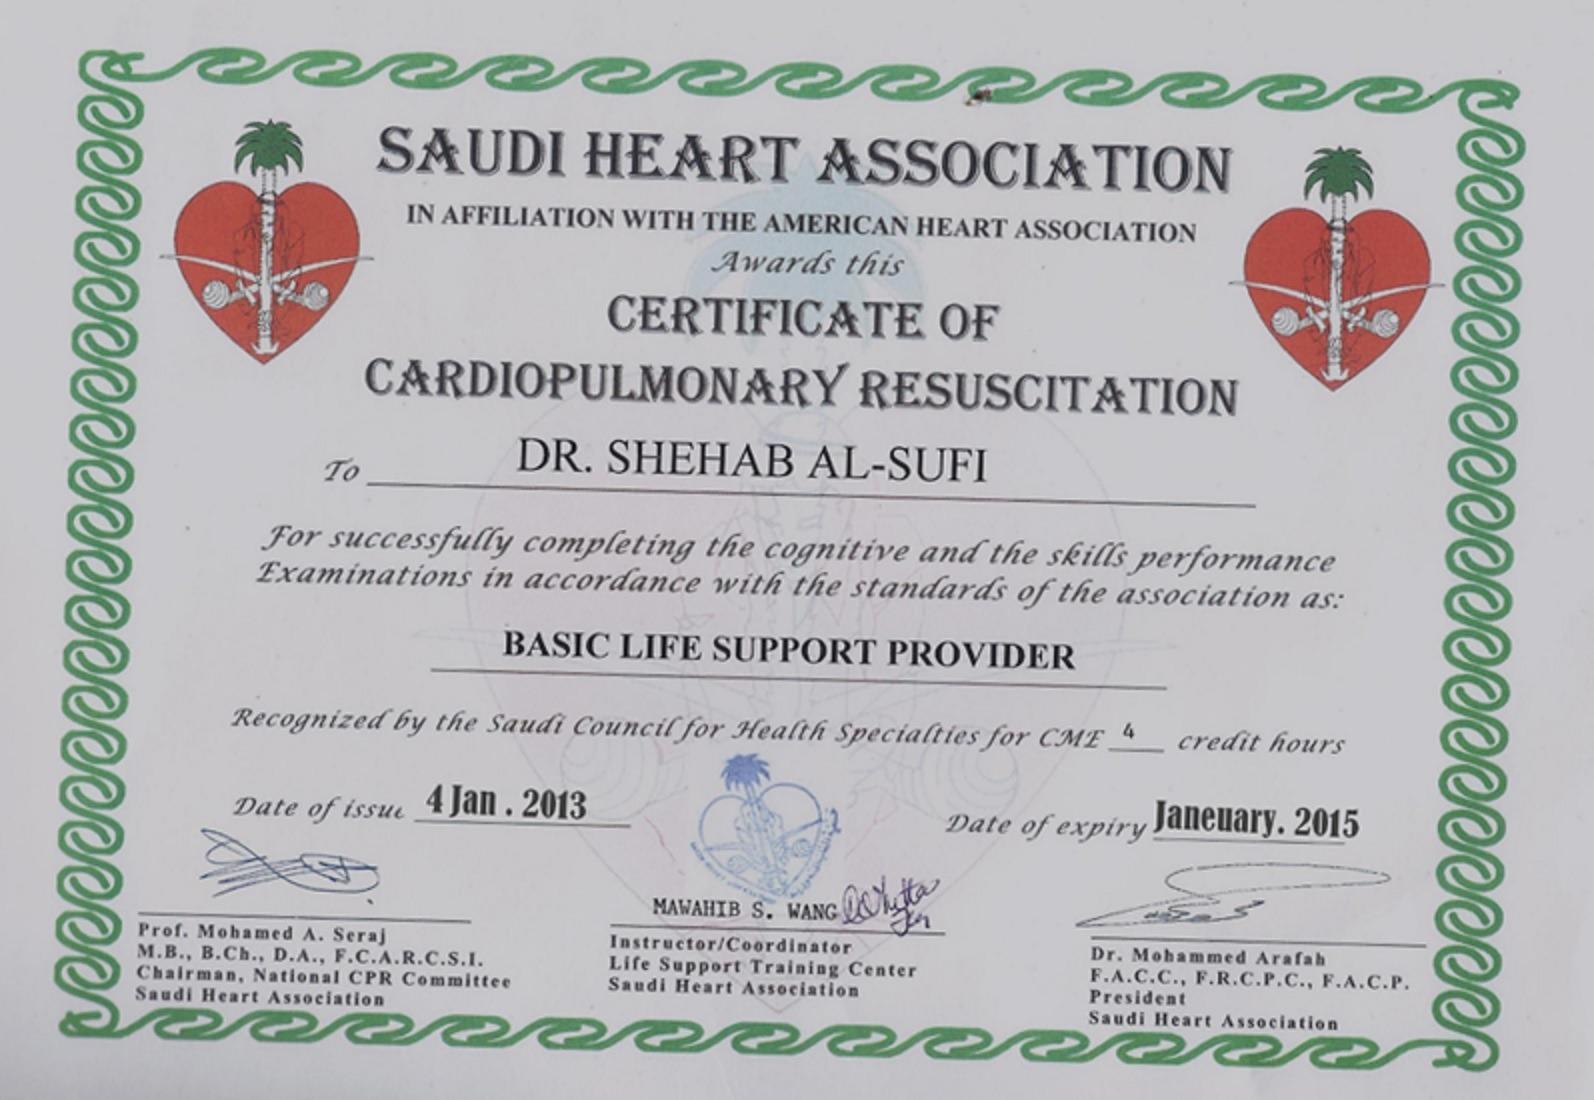 Saudi Heart Association Senior Instructor Interframe Media